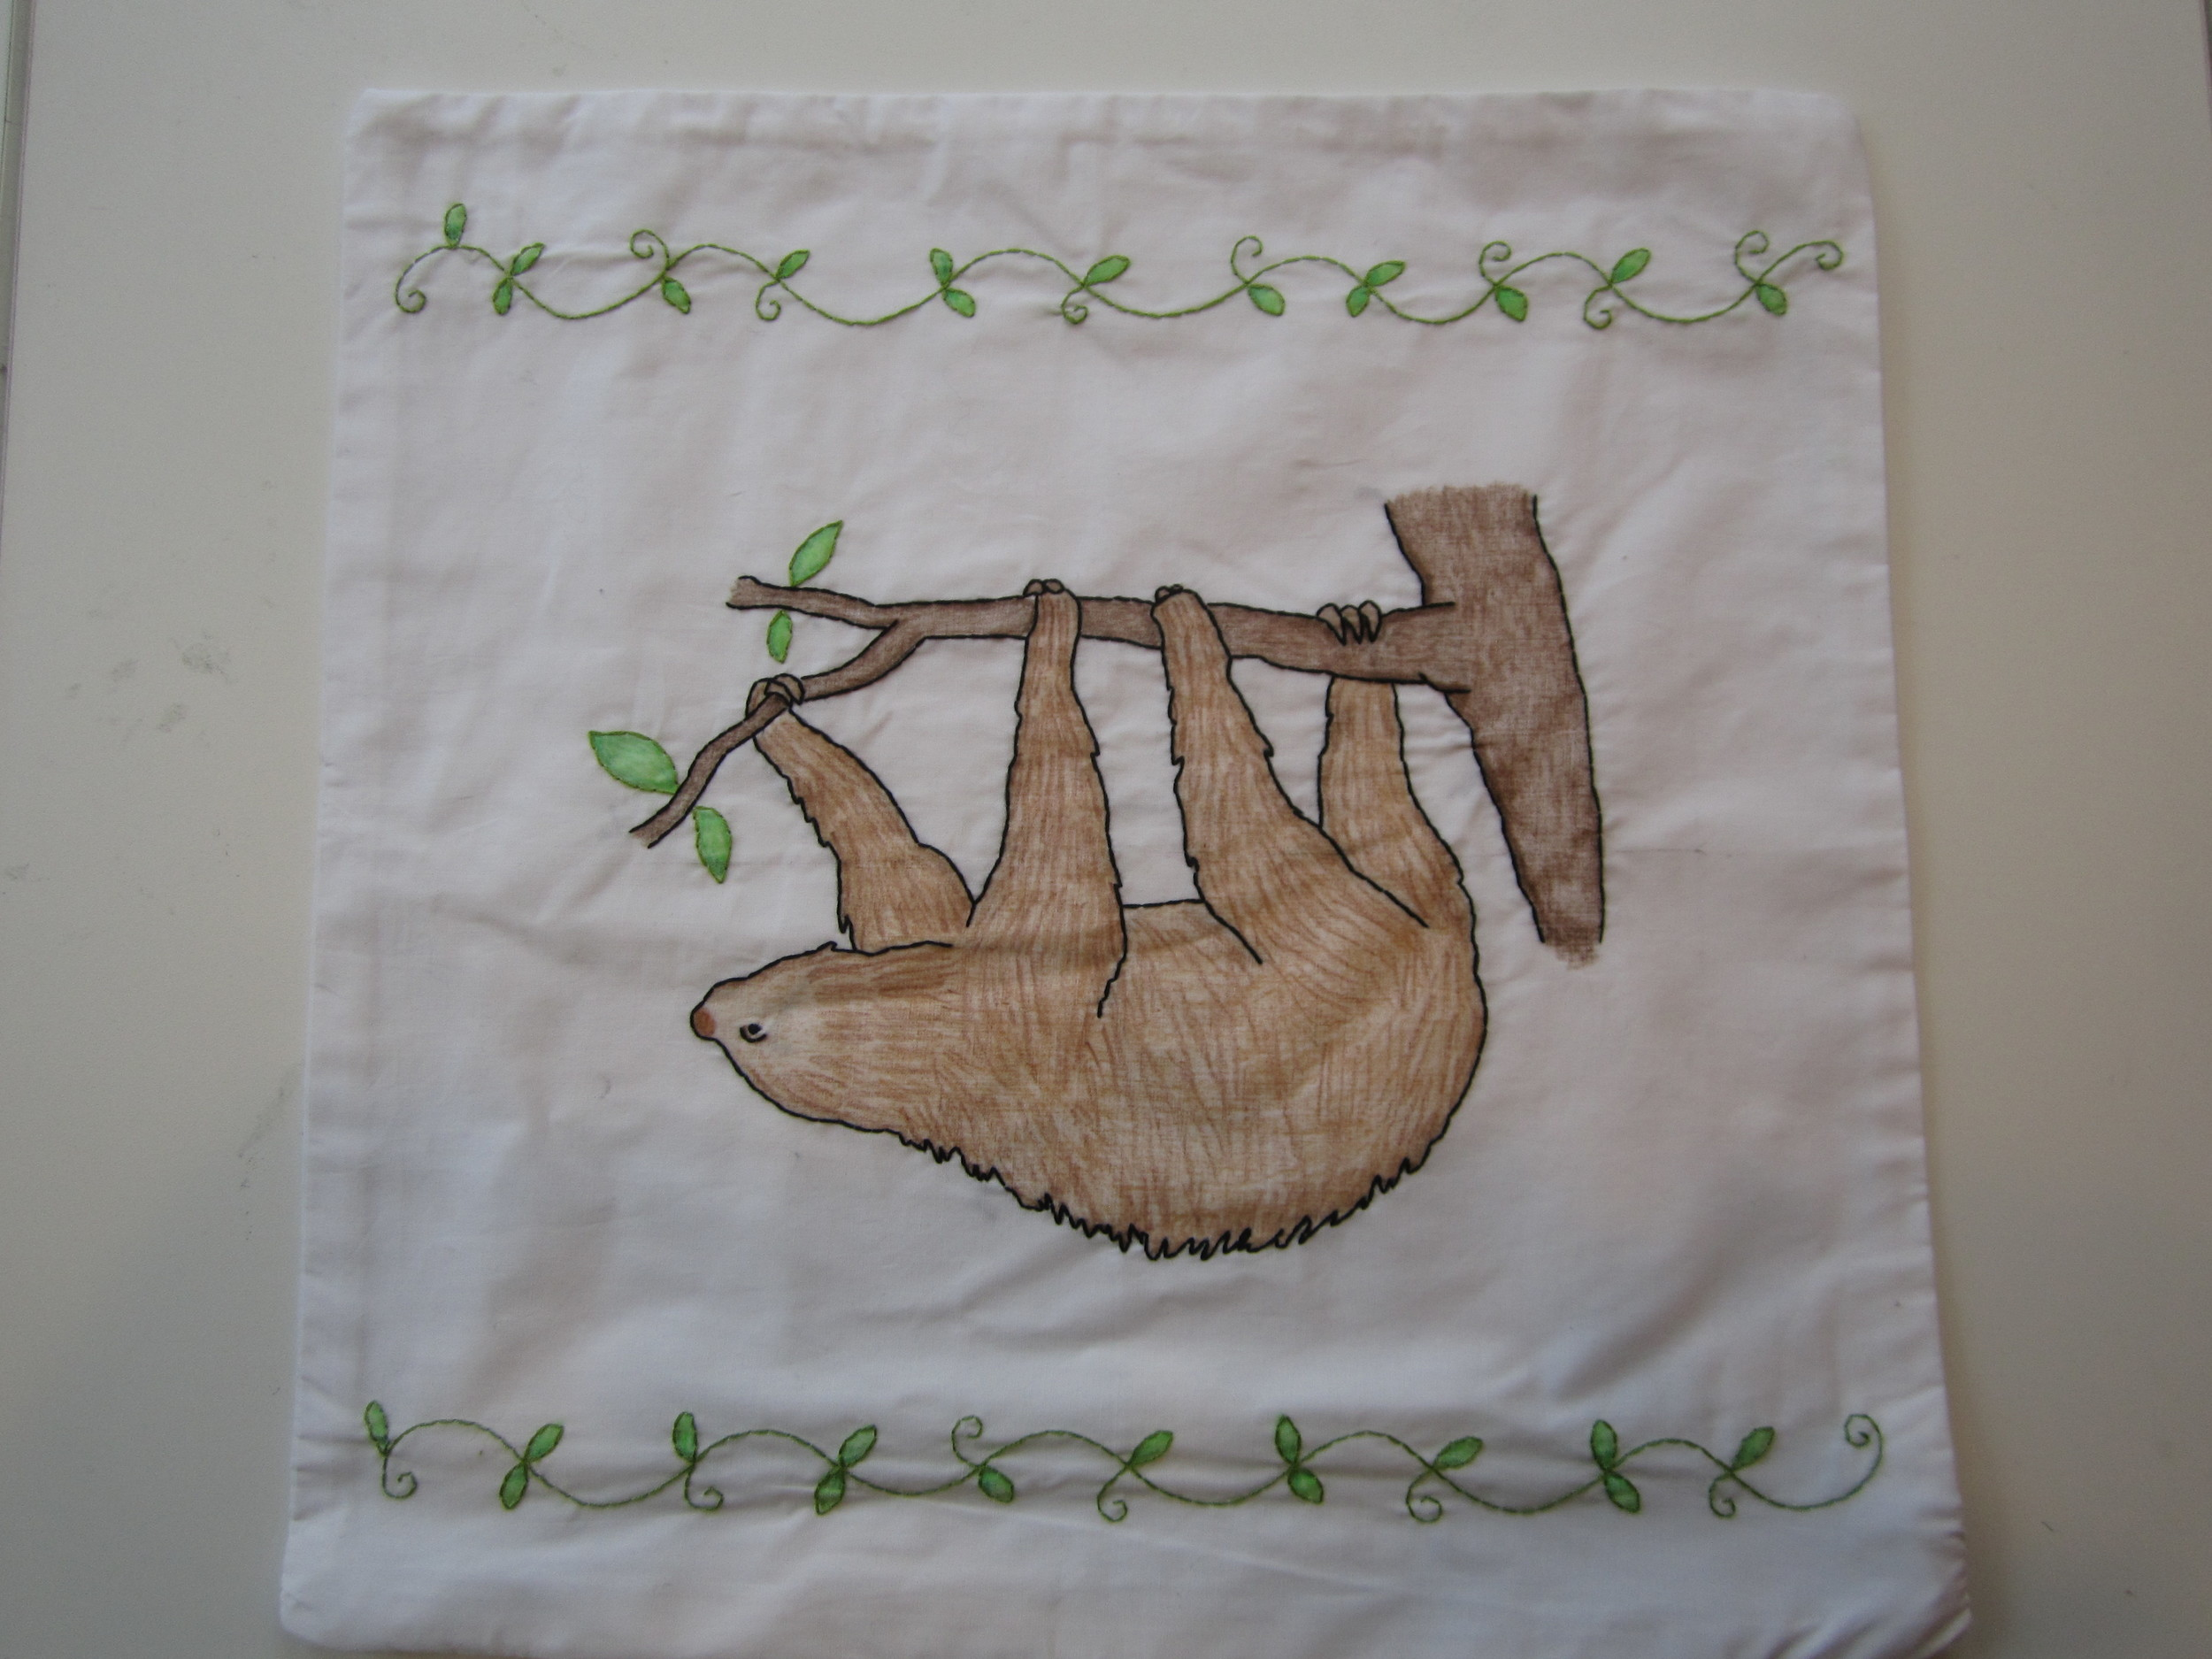 Sloth Pillowcase 1.JPG